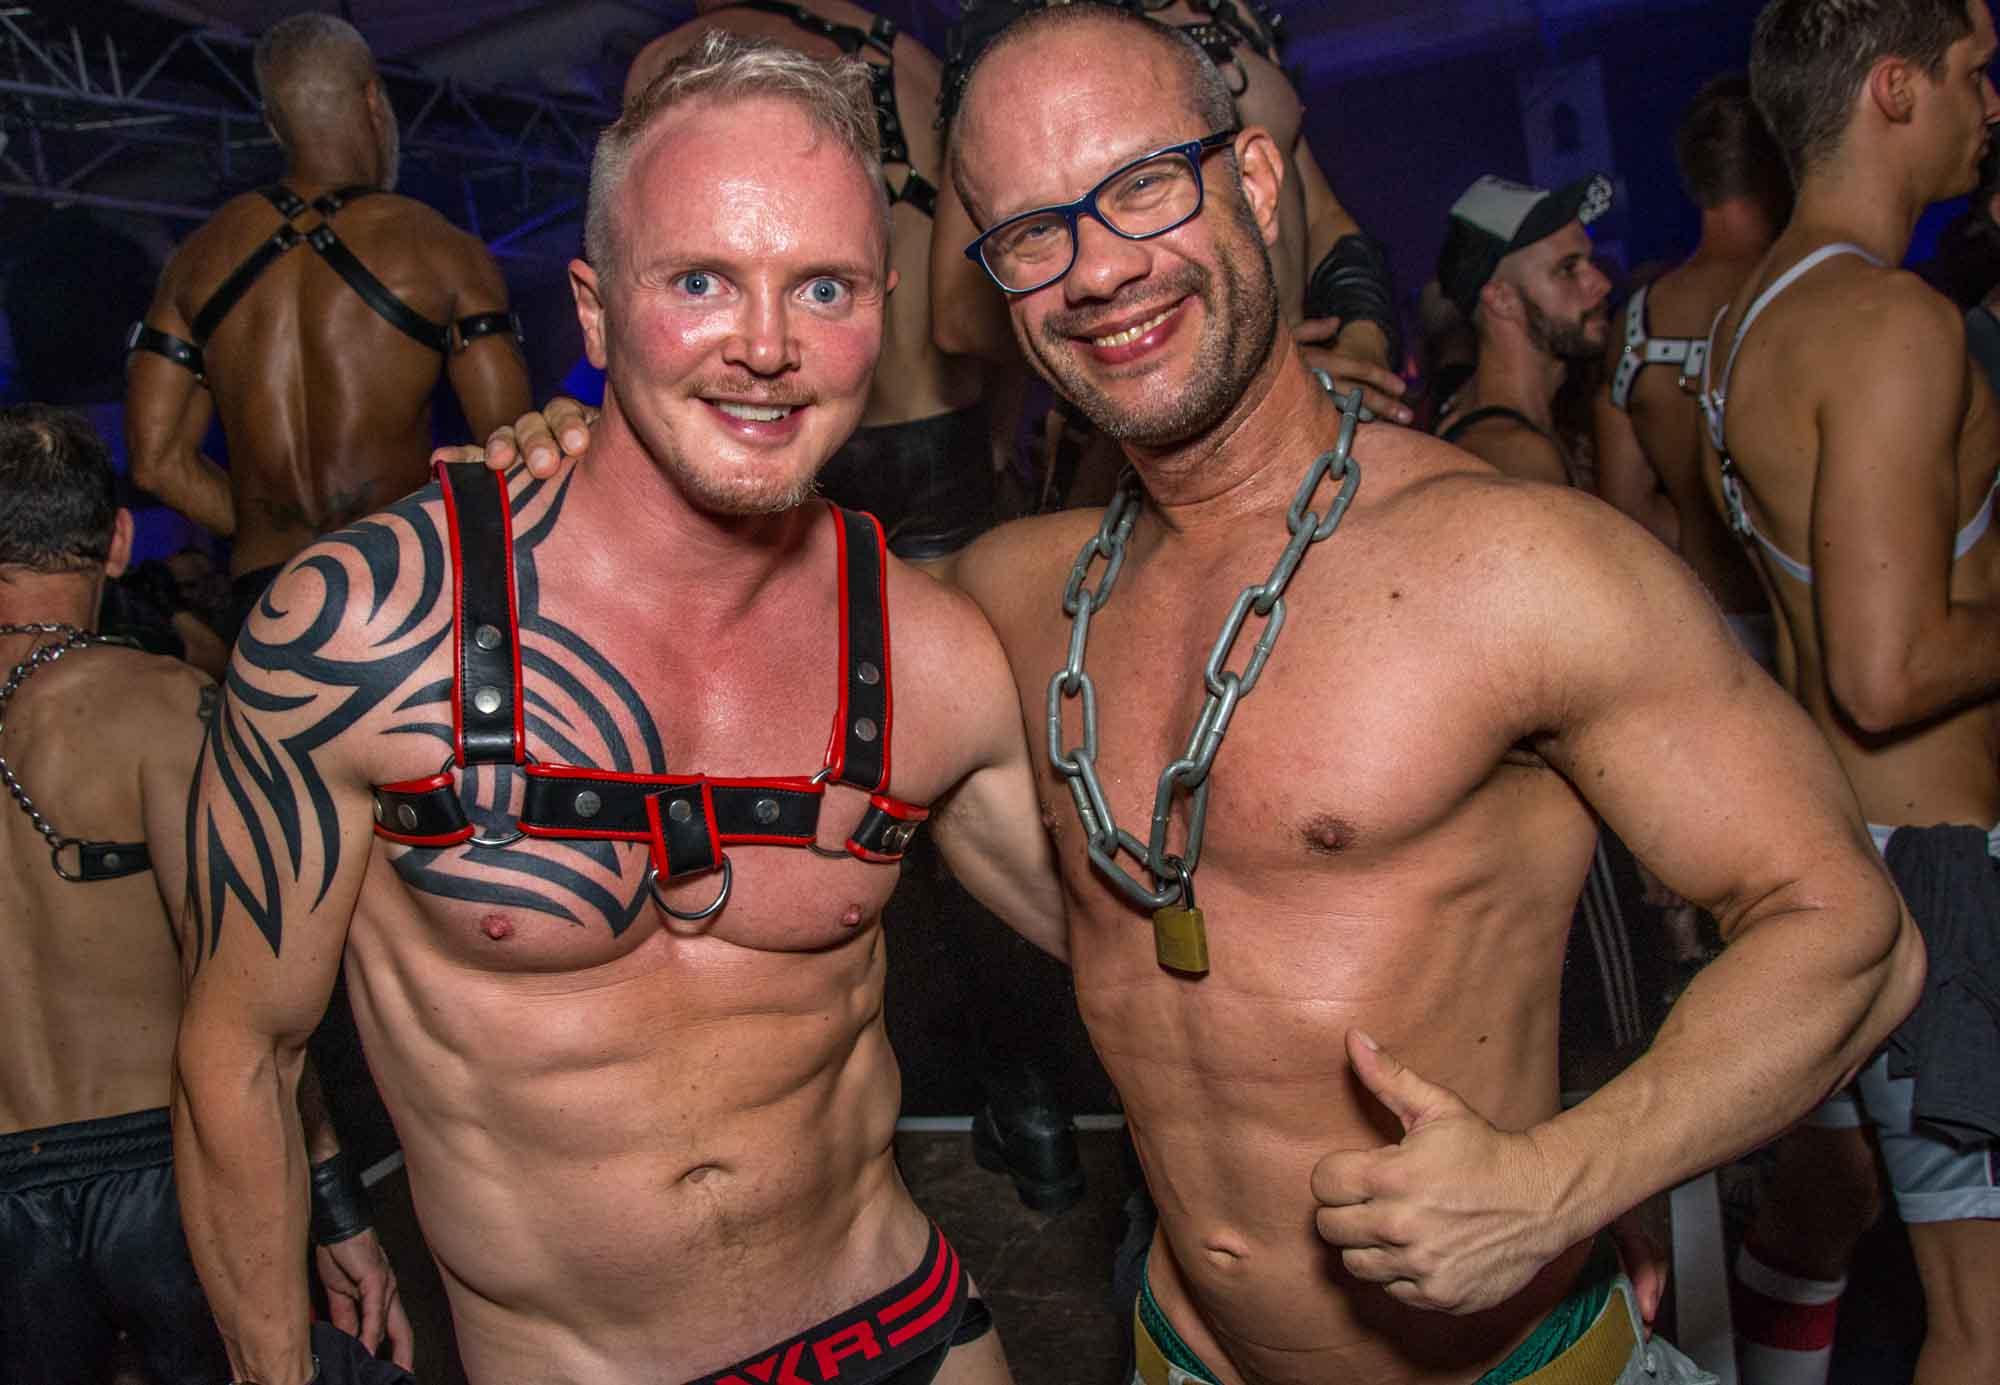 EXTREME - Cologne Pride 2017